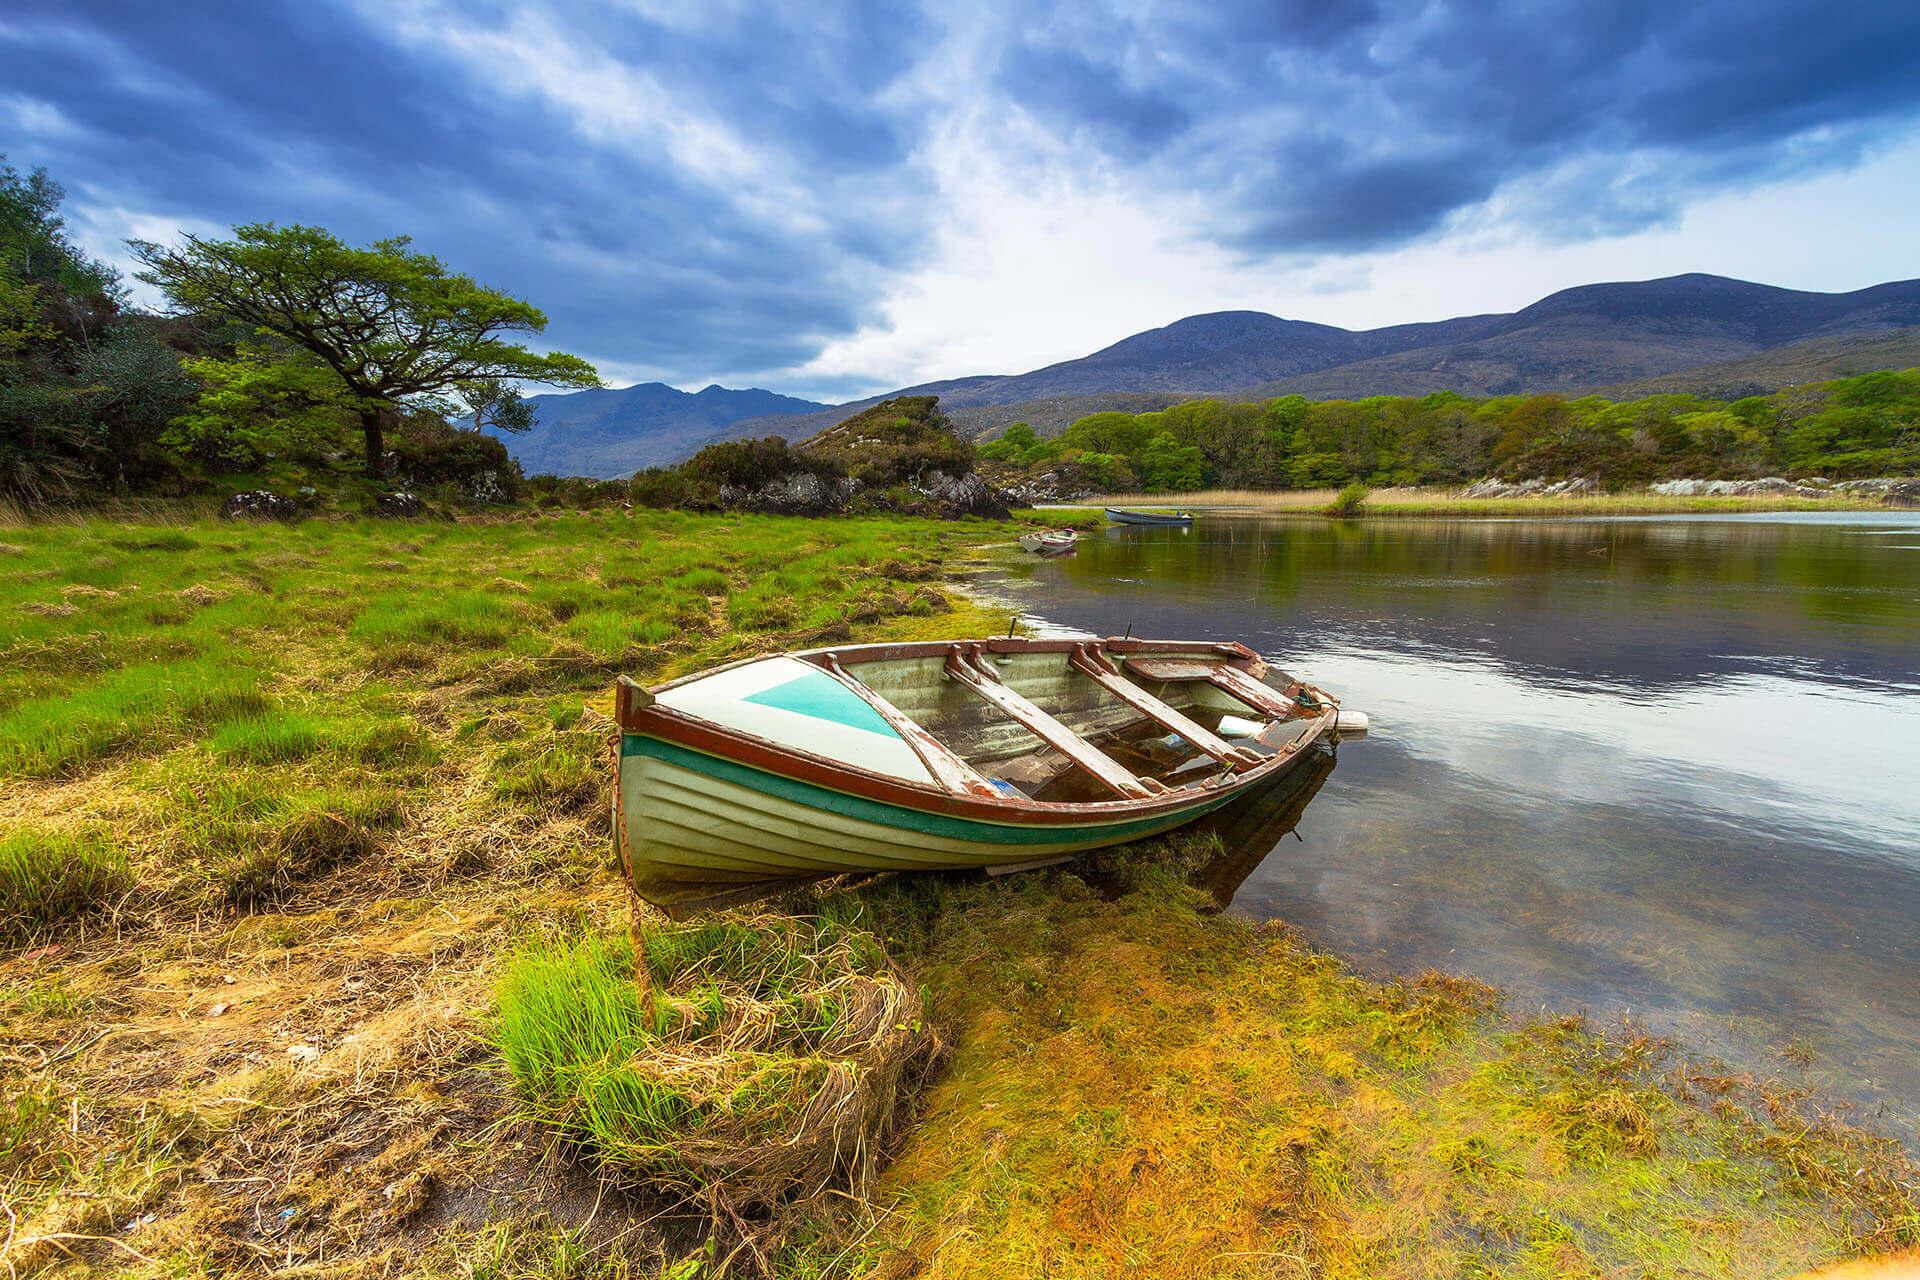 Ireland: EU Digital COVID Certificate Third Country Portal for Irish Citizens